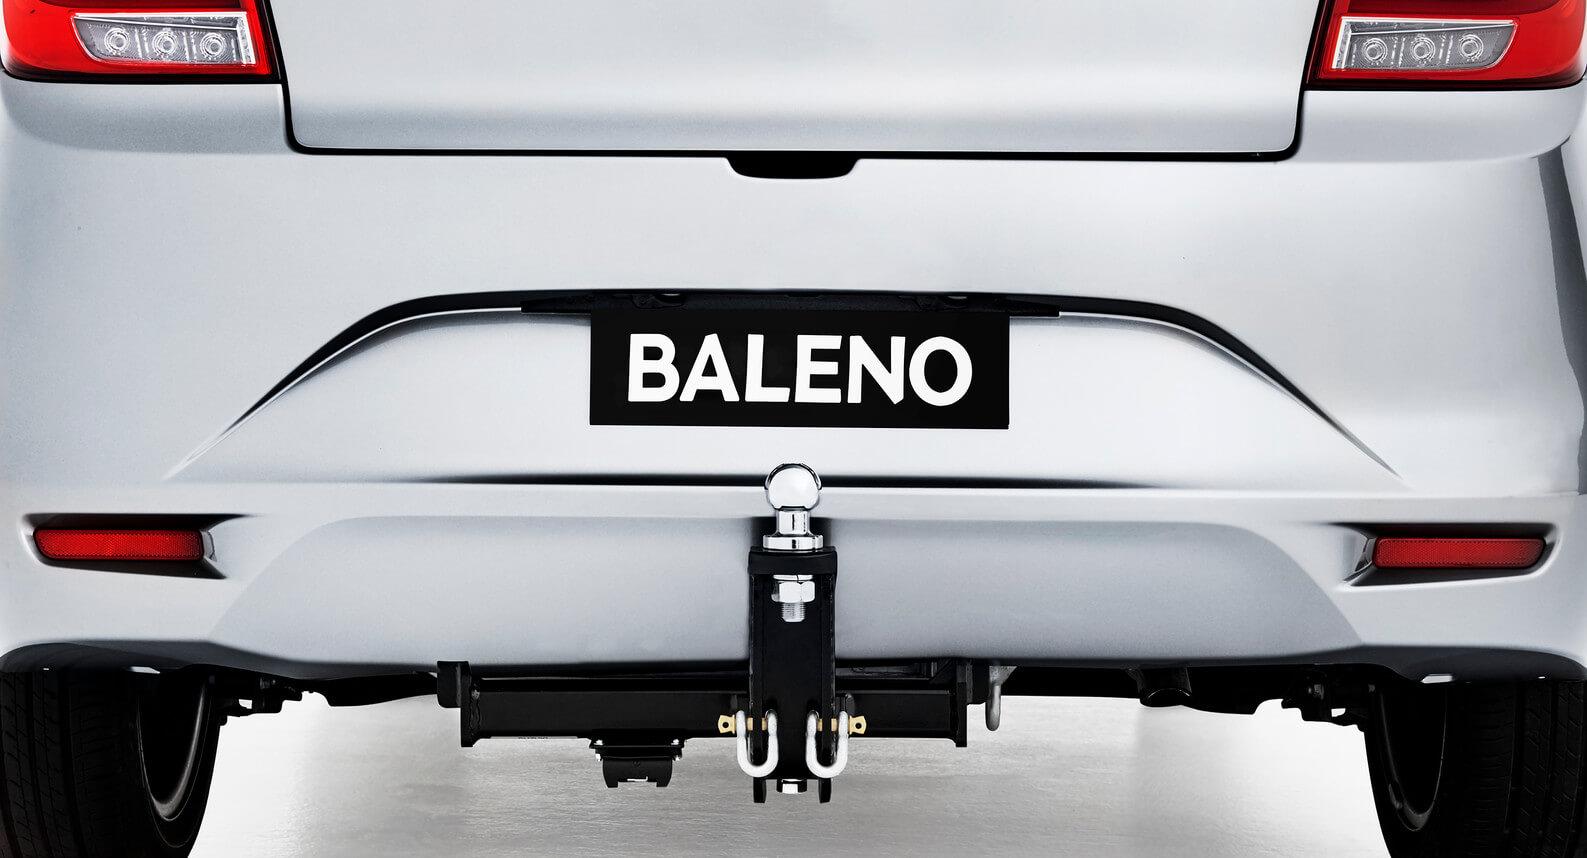 Baleno - Tow Bar Kit